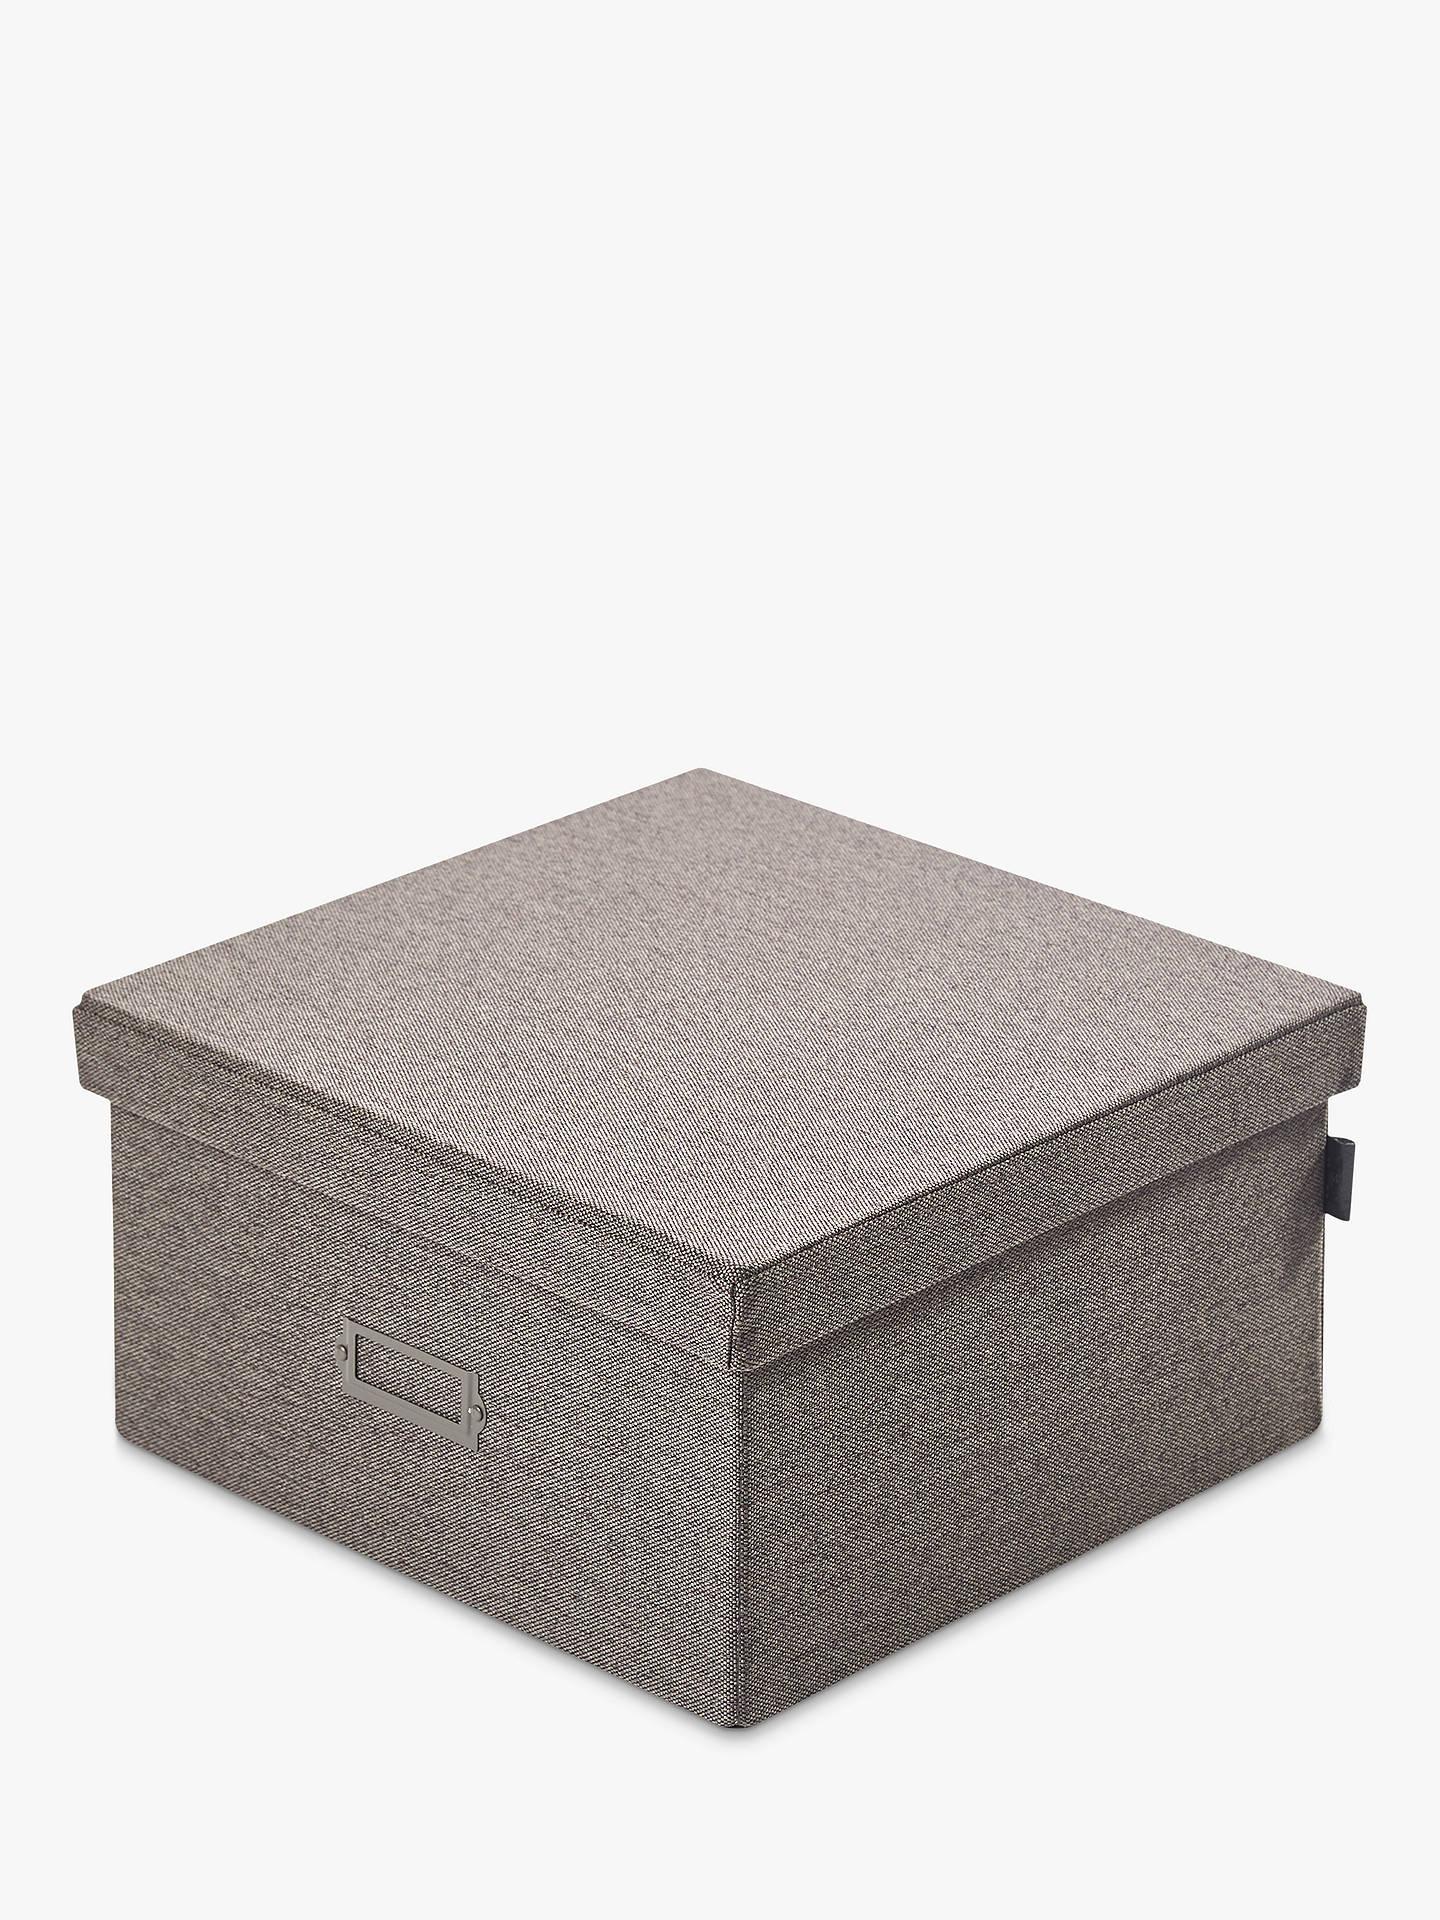 Kvell Stax Storage Box, Small, Grey Mid at John Lewis ...